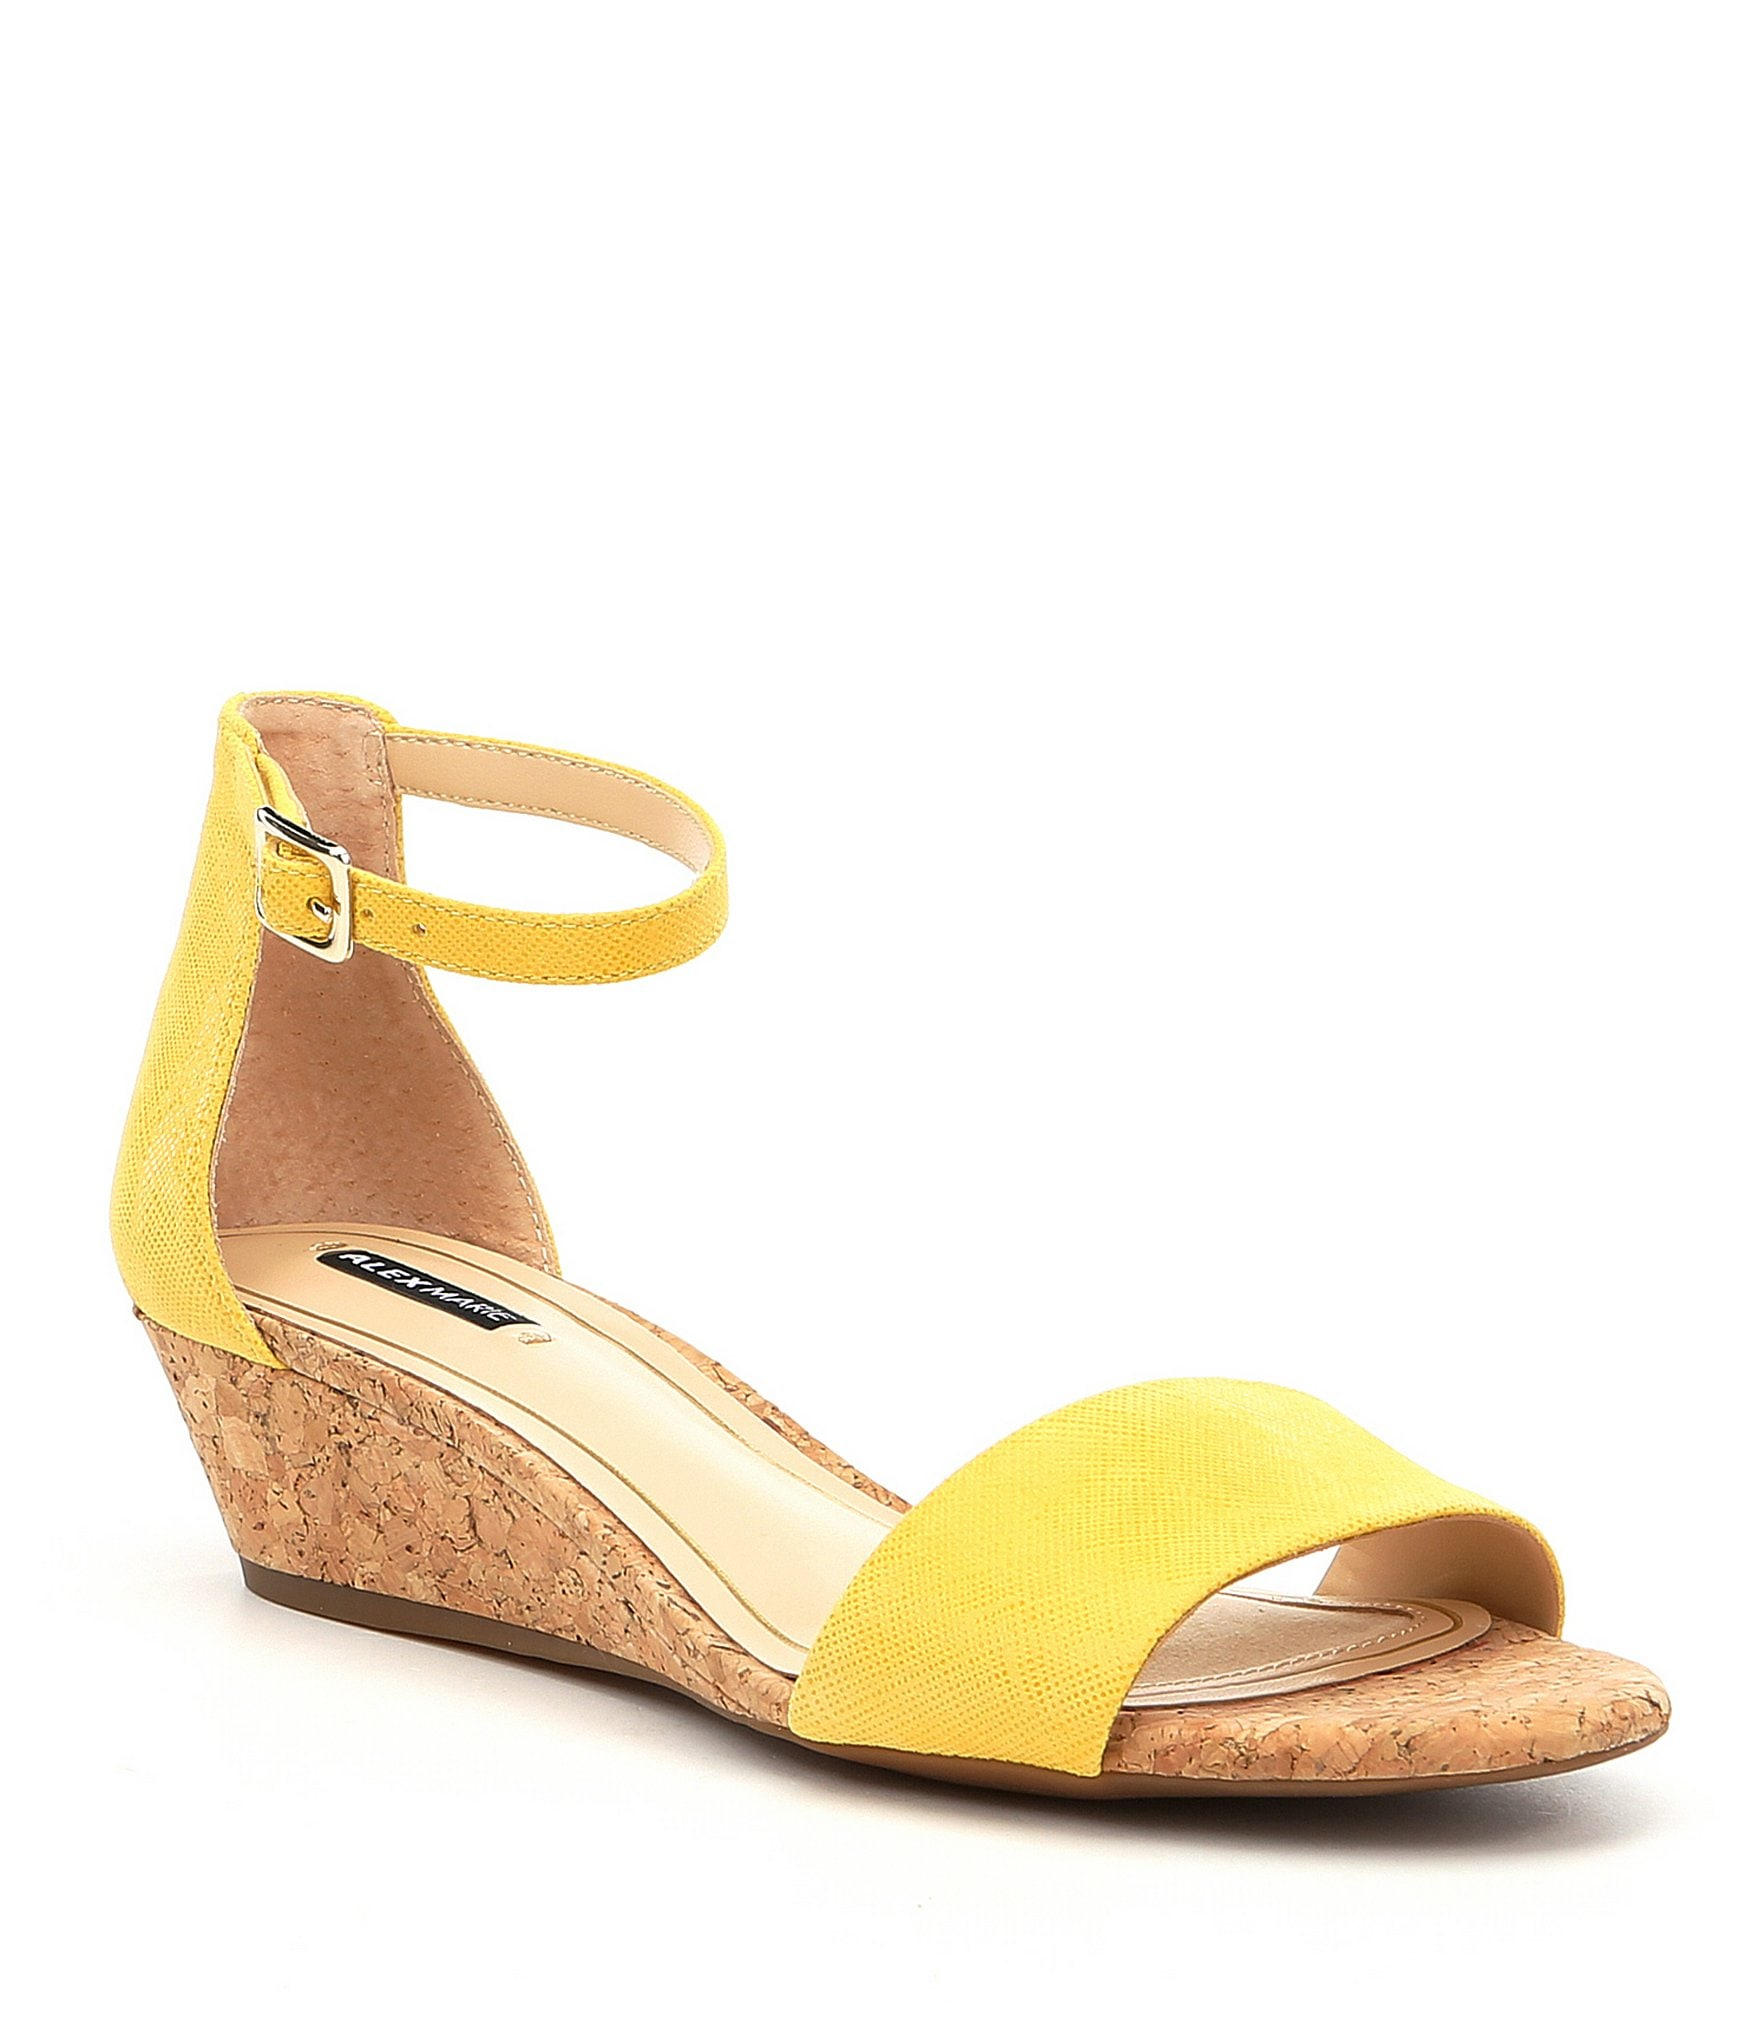 Alex Marie Mairitwo Ankle Strap Cork Wedge Sandals Dillard S